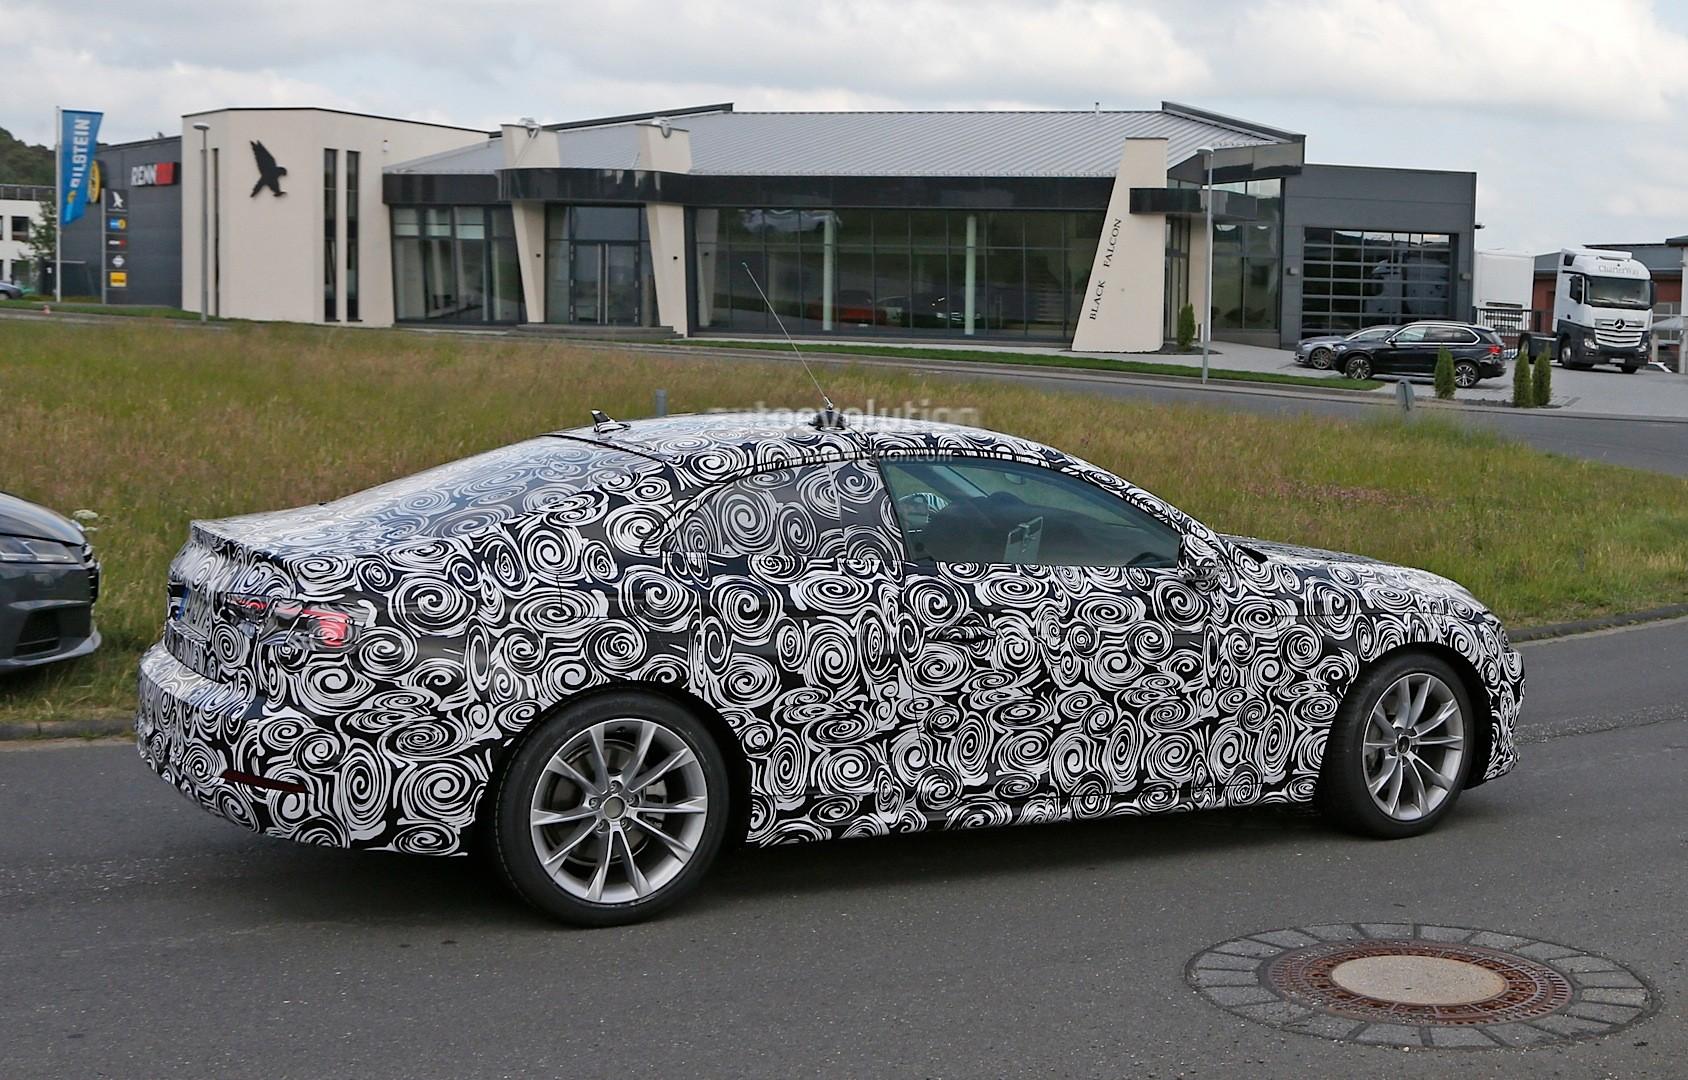 2016 - [Audi] A5 Coupé, Cabriolet et Sportback - Page 2 All-new-2017-audi-a5-coupe-first-spy-photos-show-evolutionary-design_6